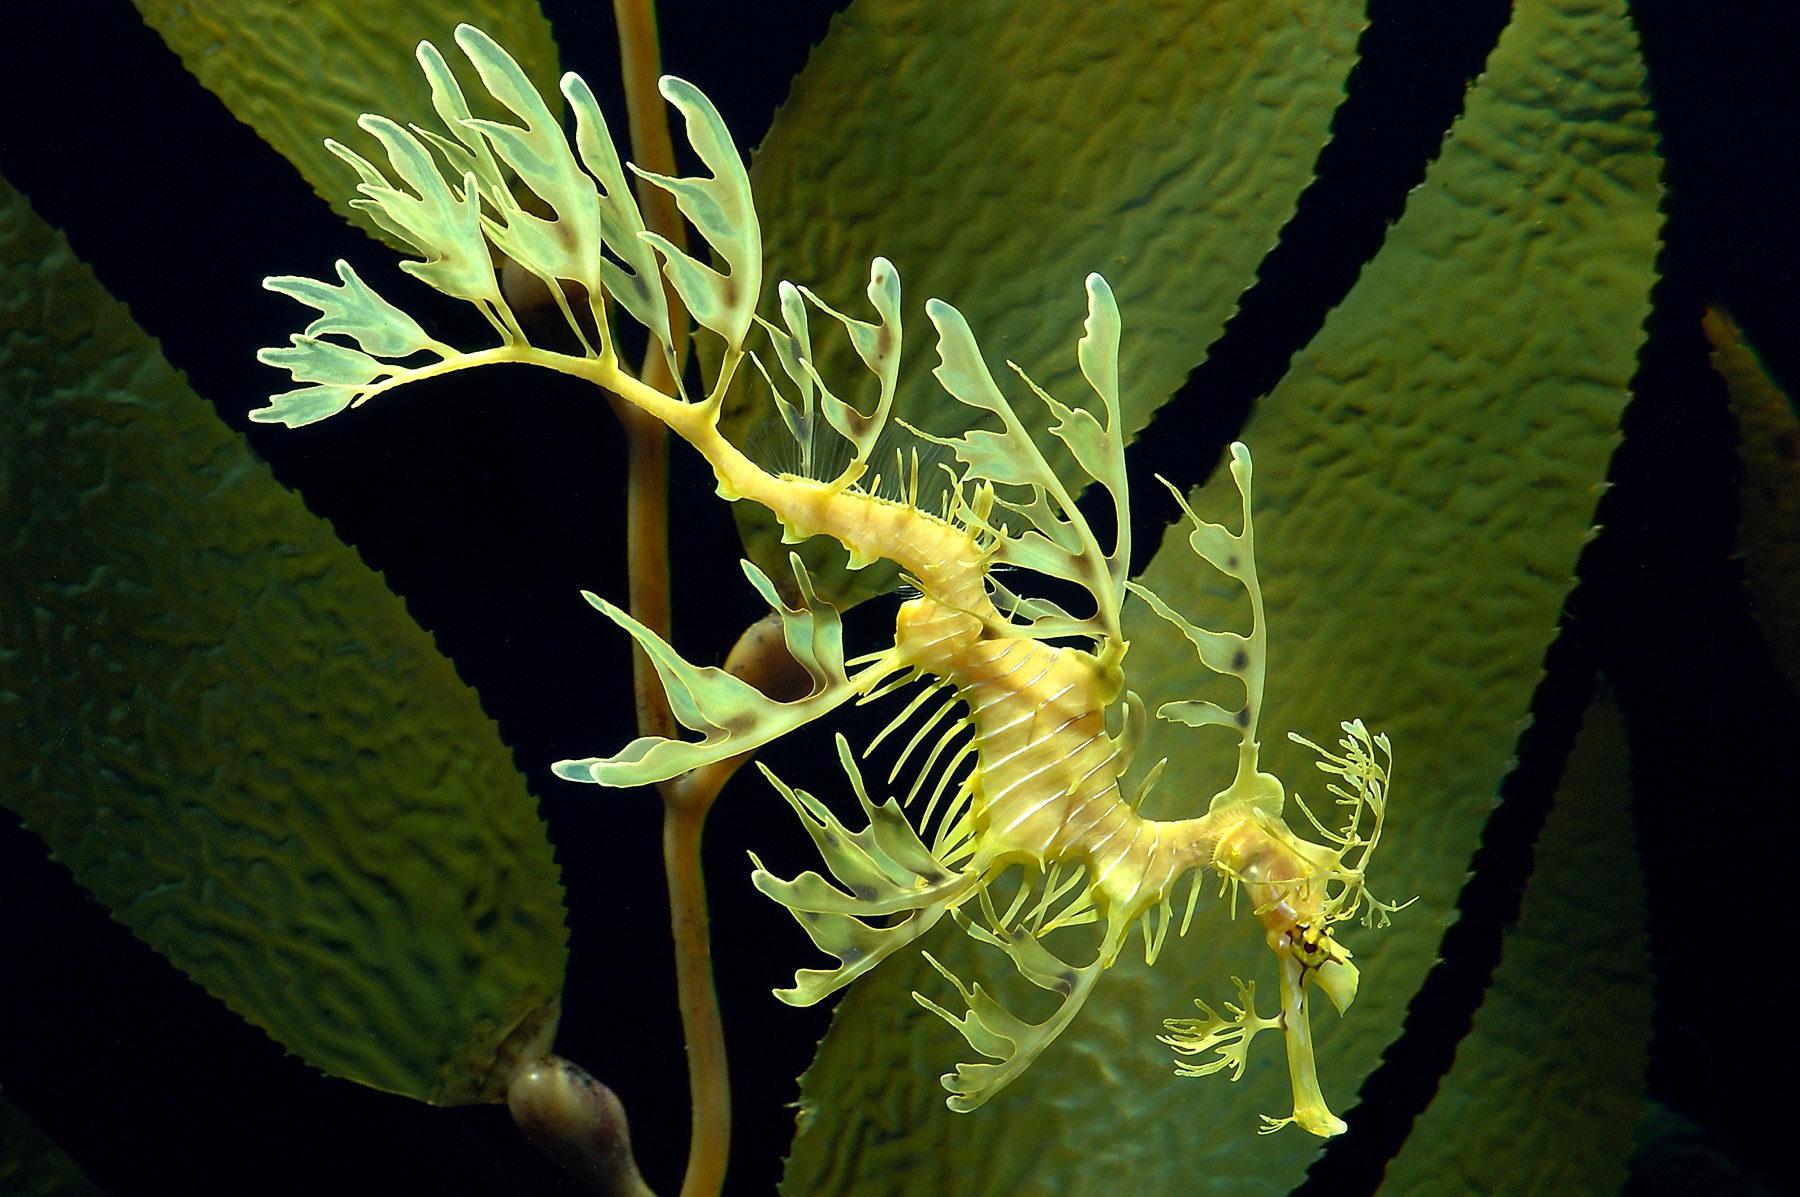 Leafy Seadragon Pics, Animal Collection